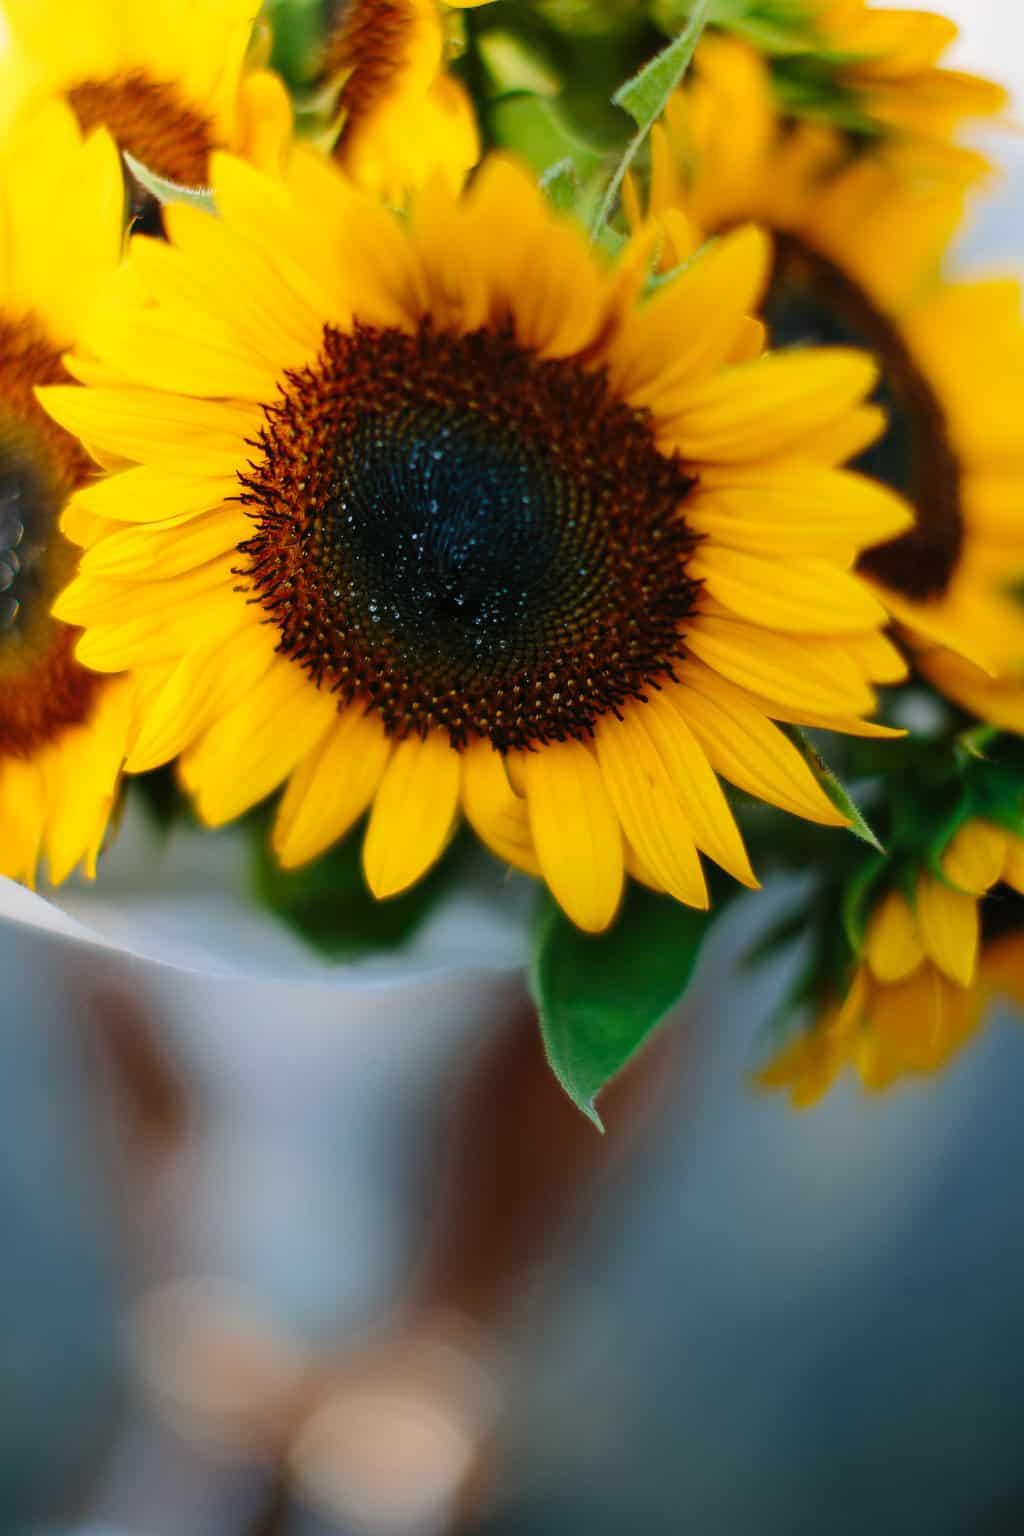 Family-Day-at-the-Davidson-Farmer's-Market-sunflower